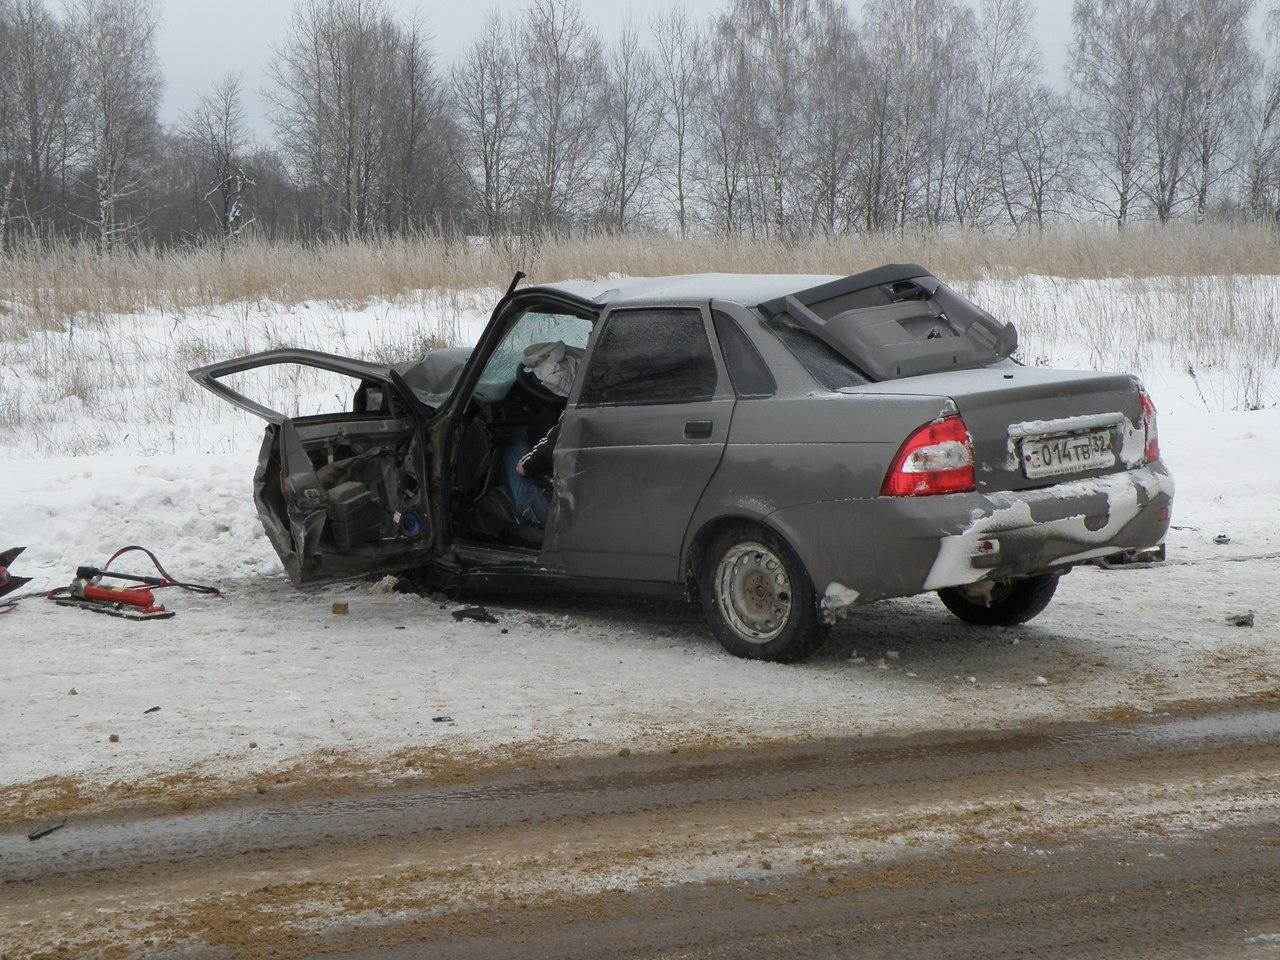 ВДТП натрассе Брянск-Дятьково умер 36-летний шофёр ВАЗ